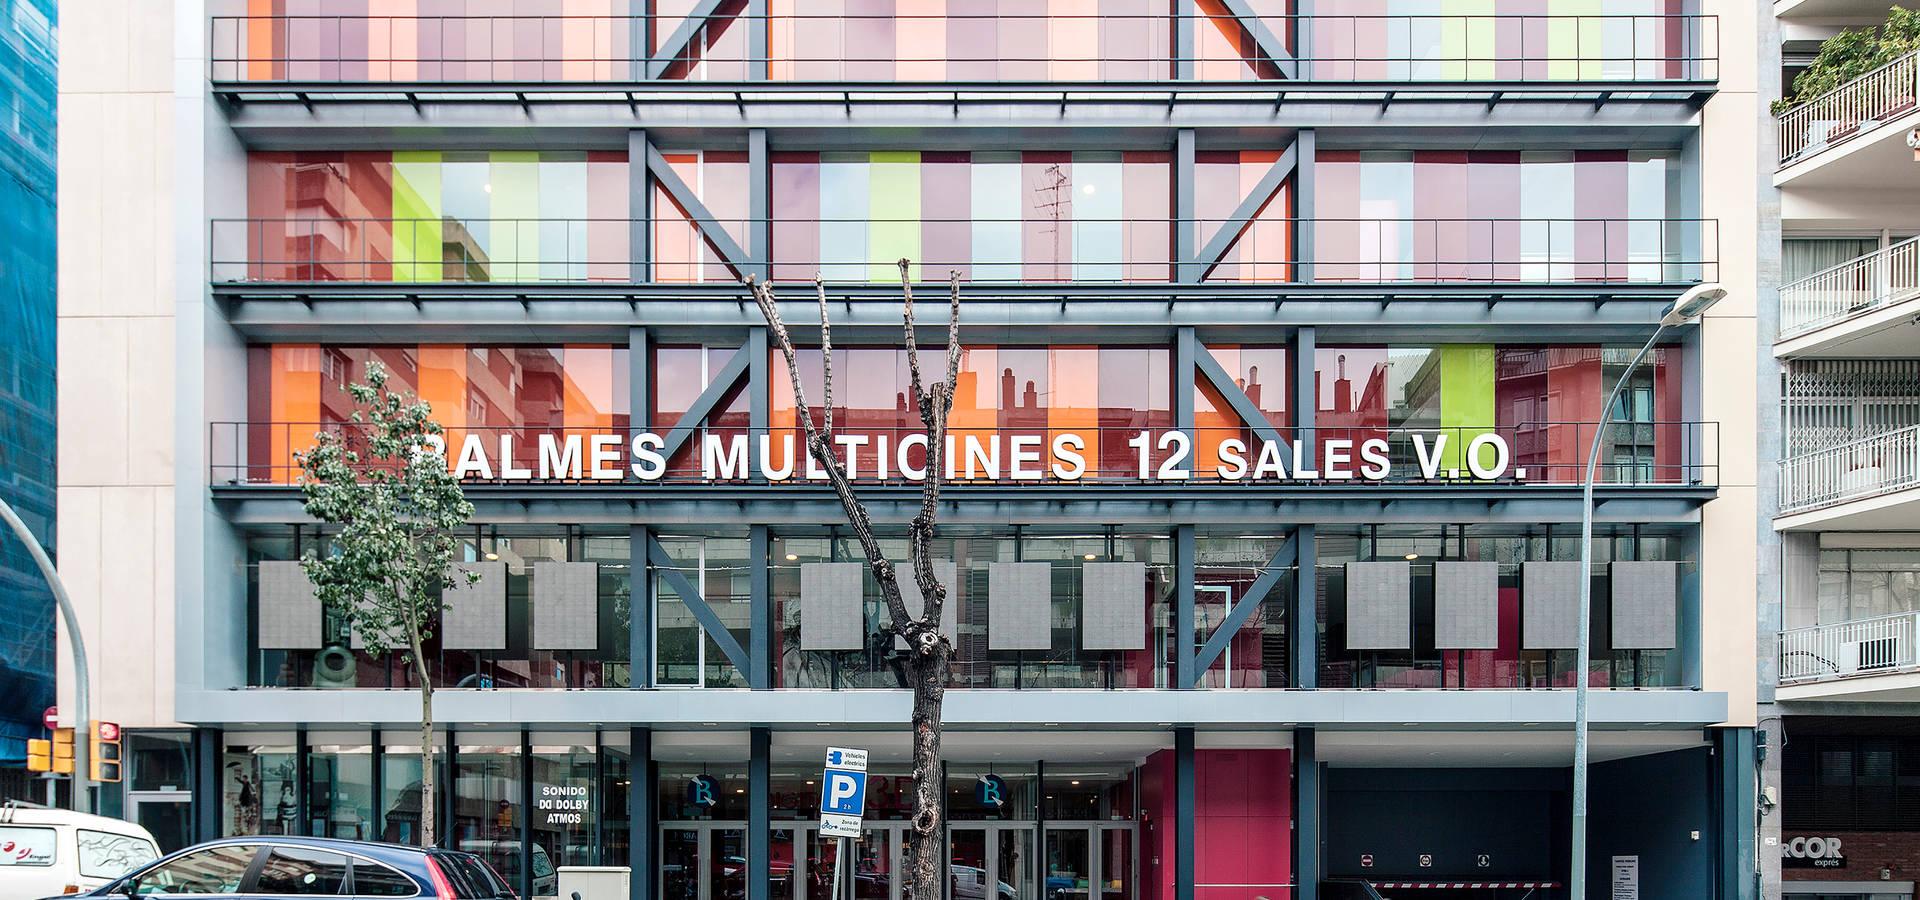 Balmes multicines de mmass arquitectura enric i robert - Balmes multicines ...